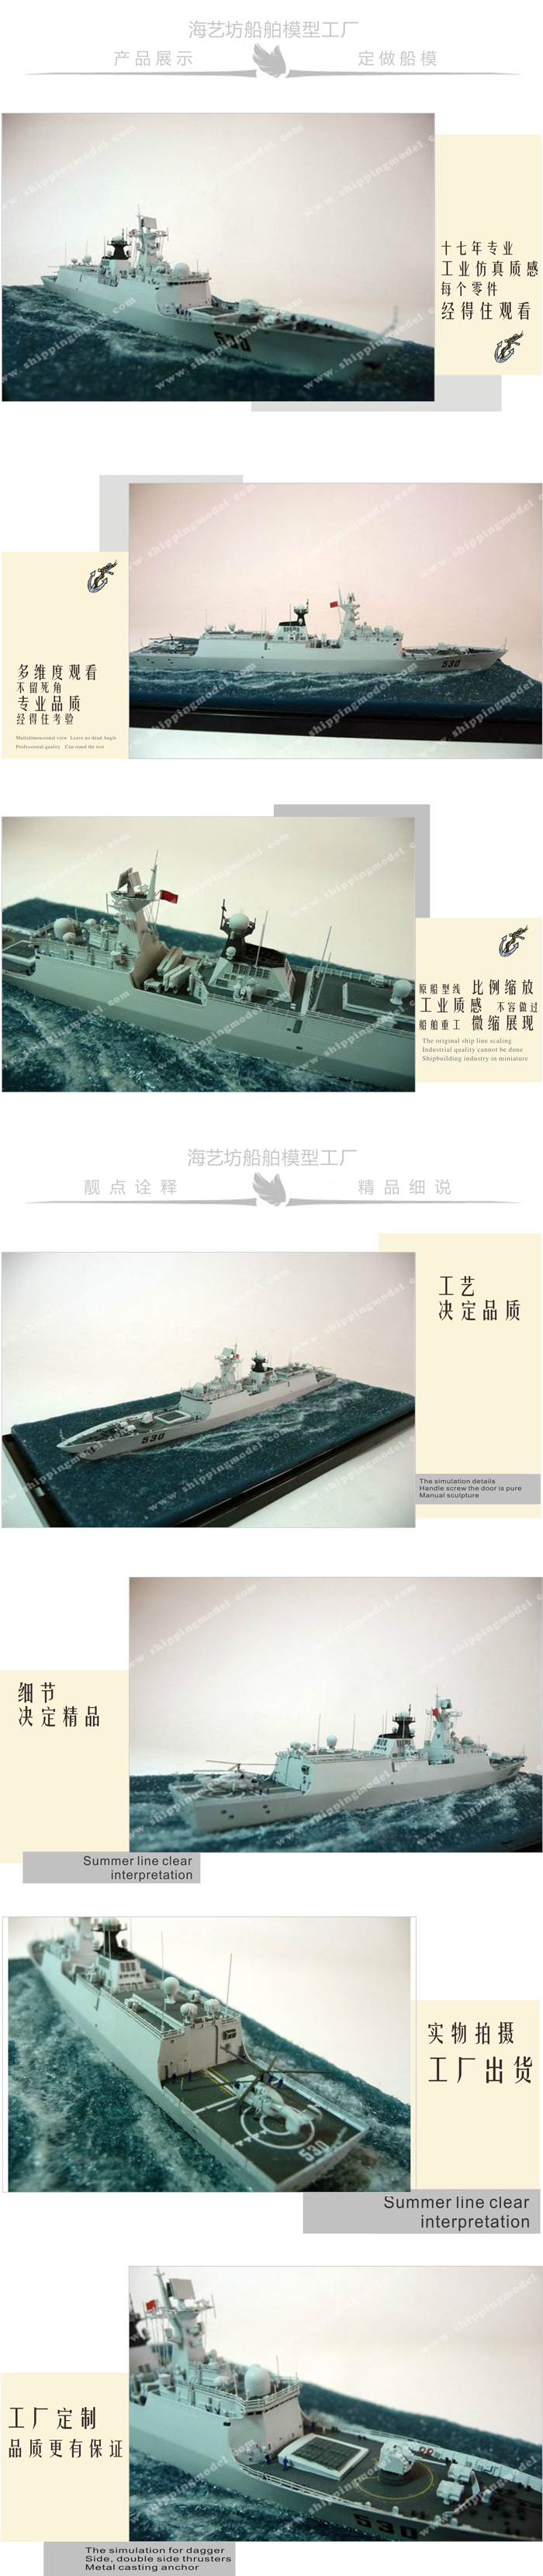 60cm航空母艦模型定制G